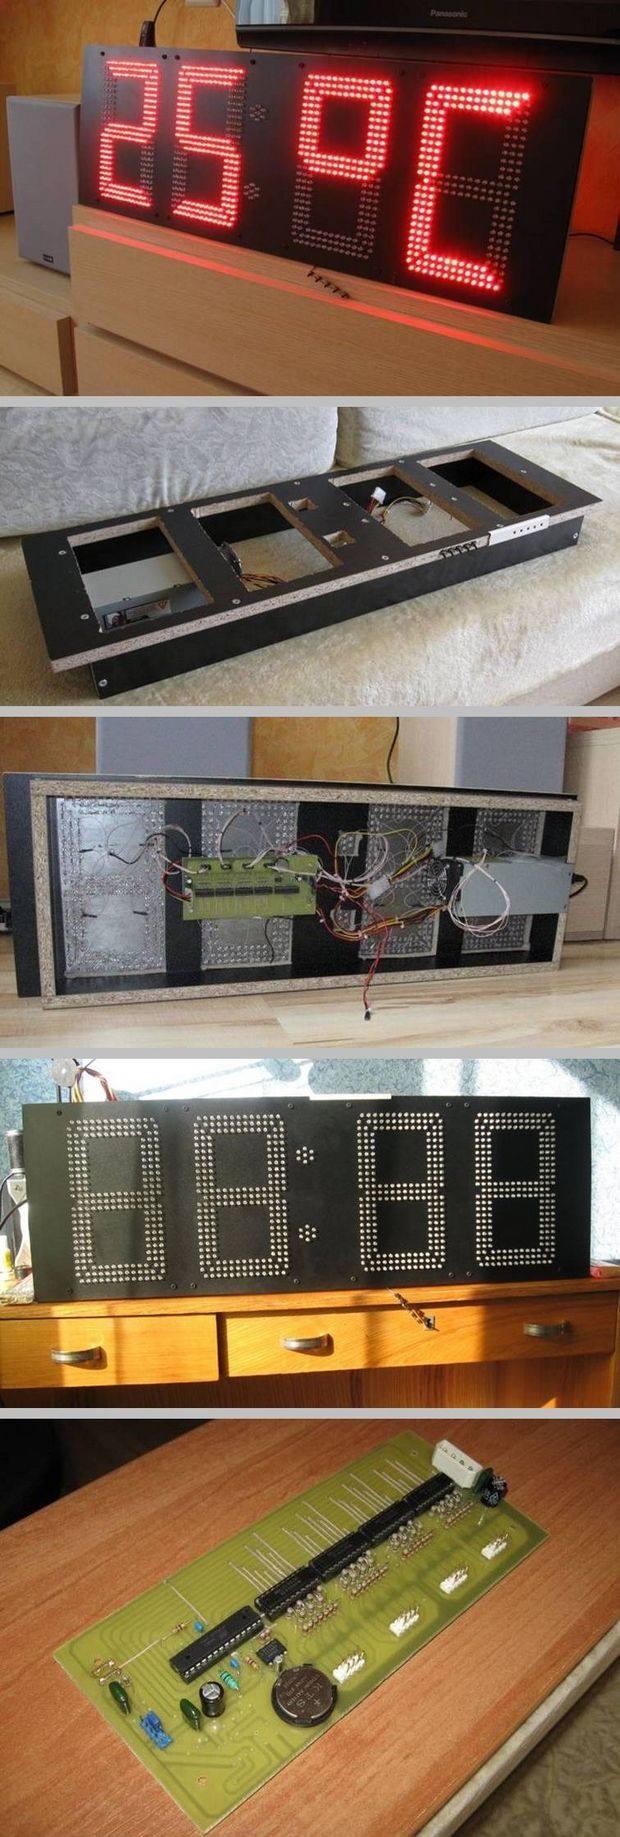 atmega8-ds1307-ds18b20-led-saat-termometre-devresi-saat-devresi